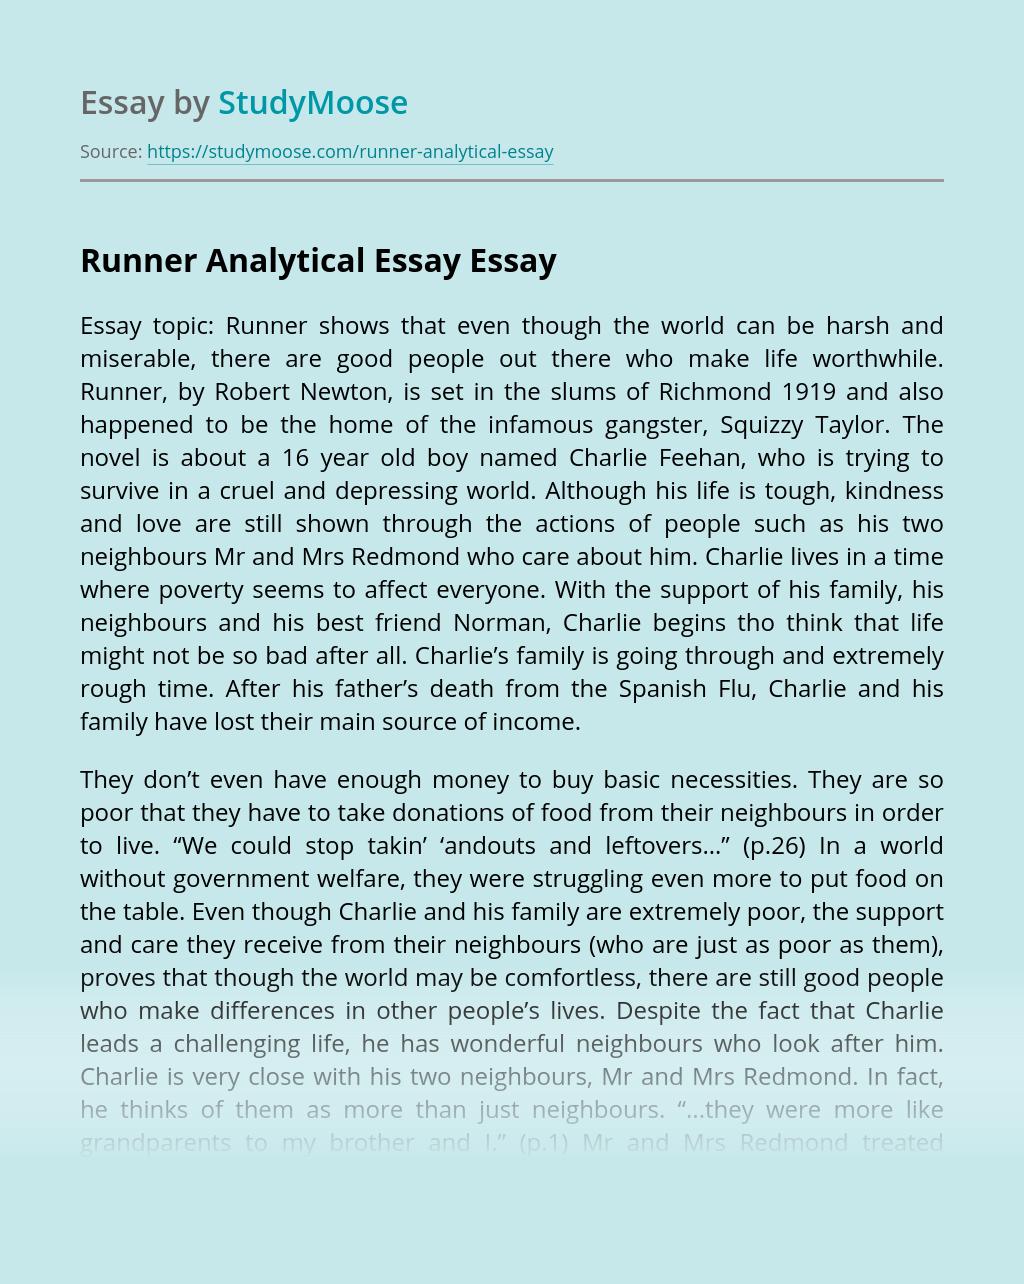 Runner Analytical Essay